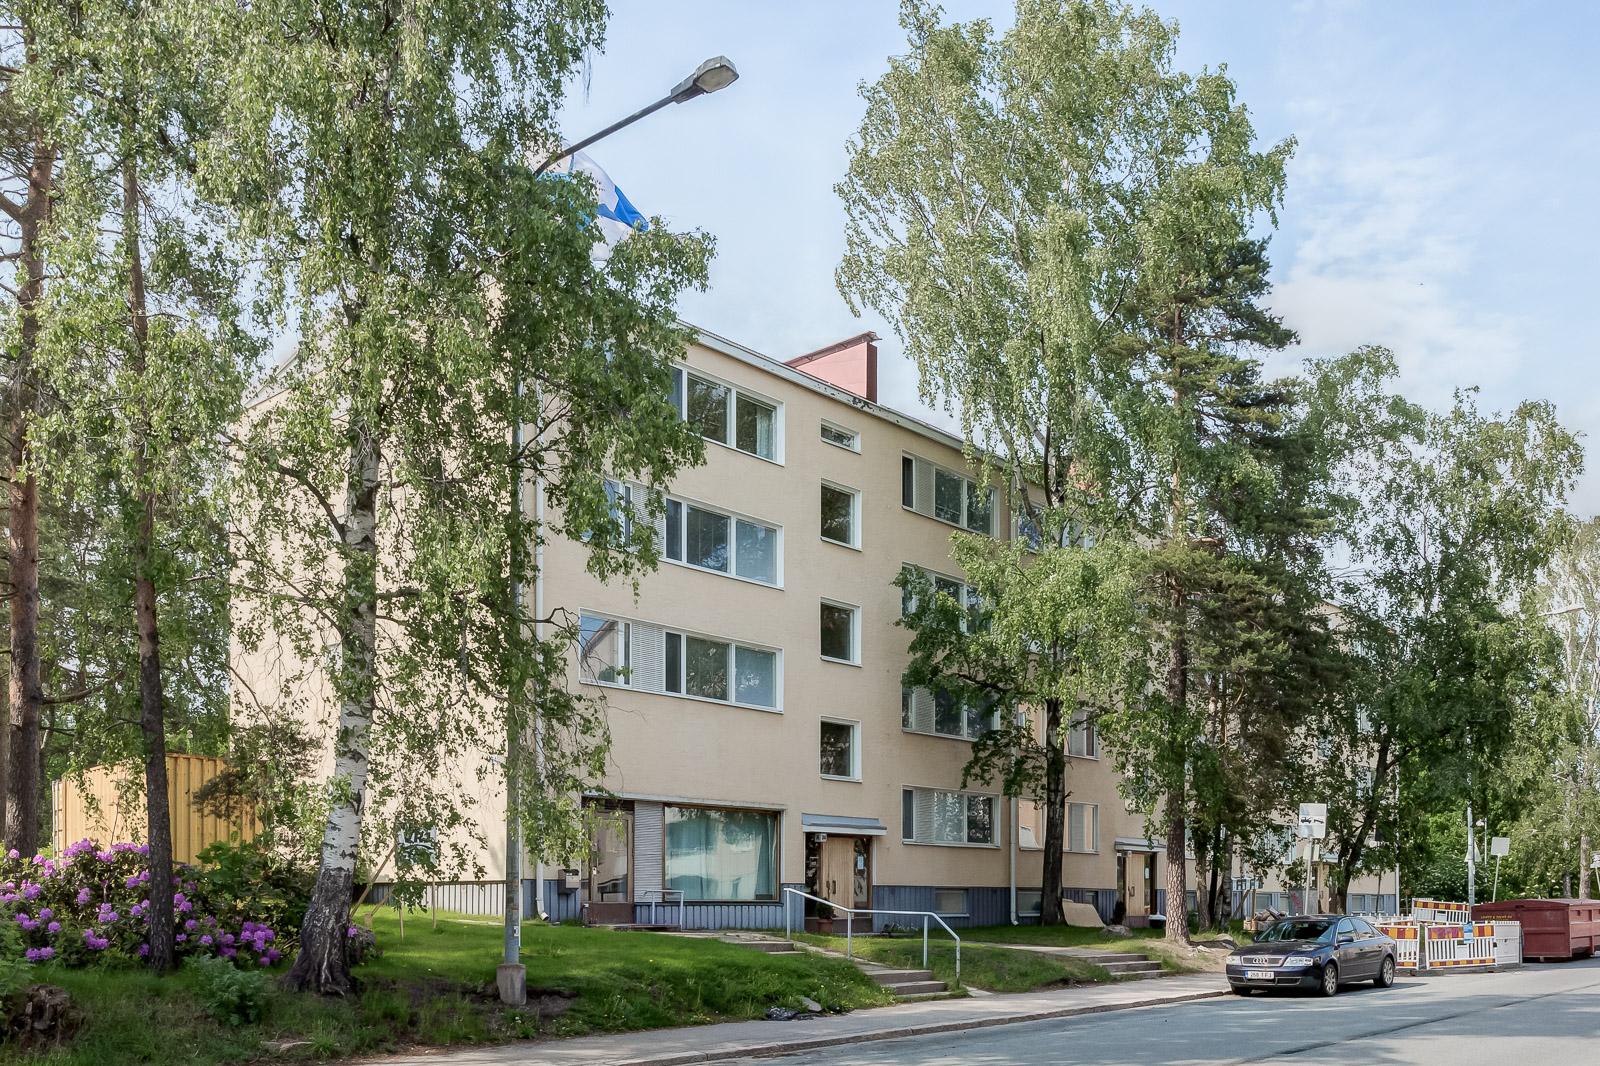 KT 1-2h Herttoniemi, Helsinki